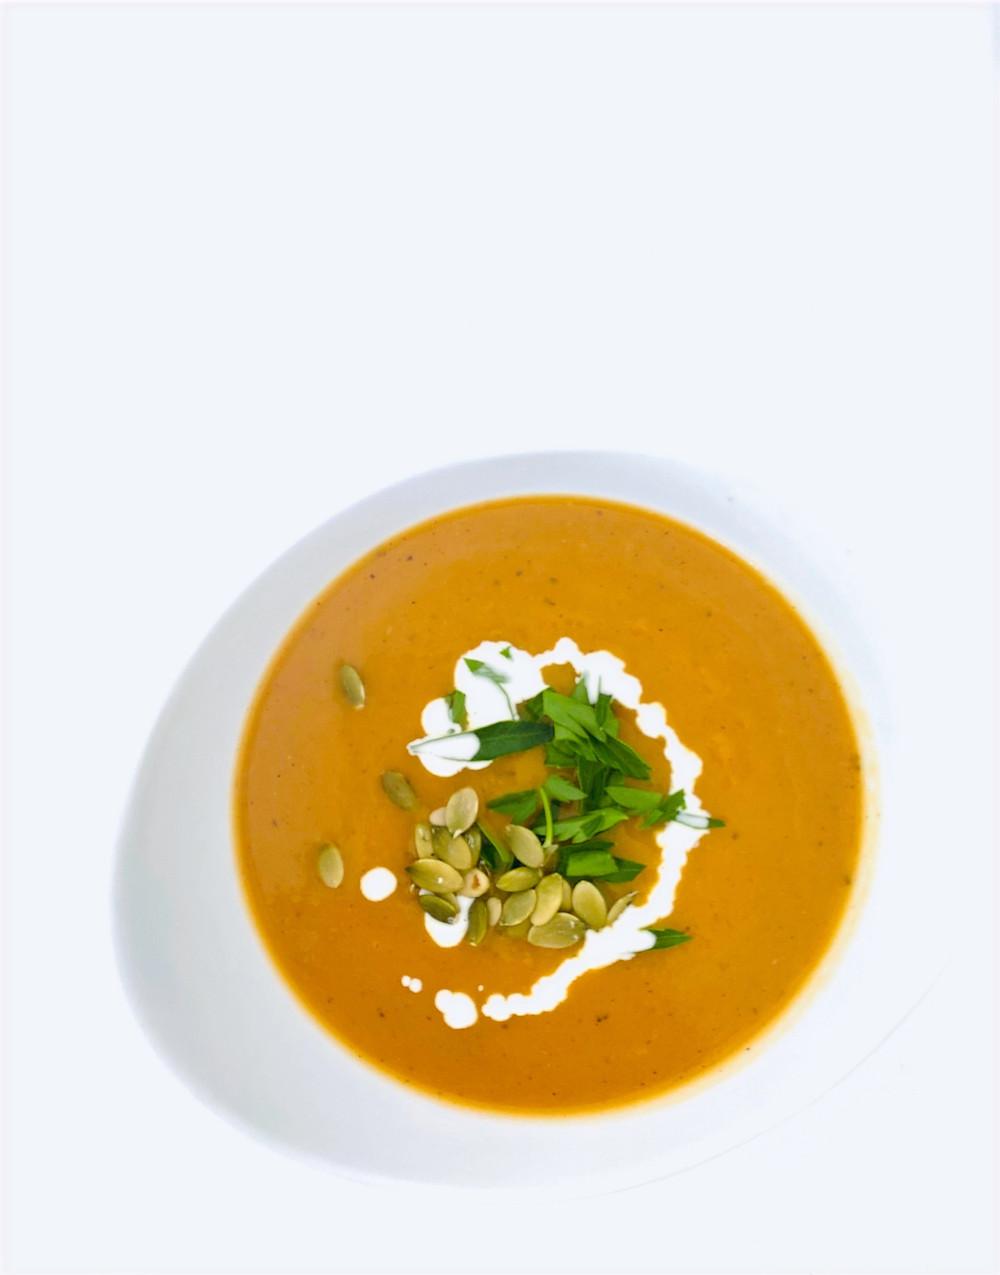 Butternut Squash Apple Soup in a white bowl